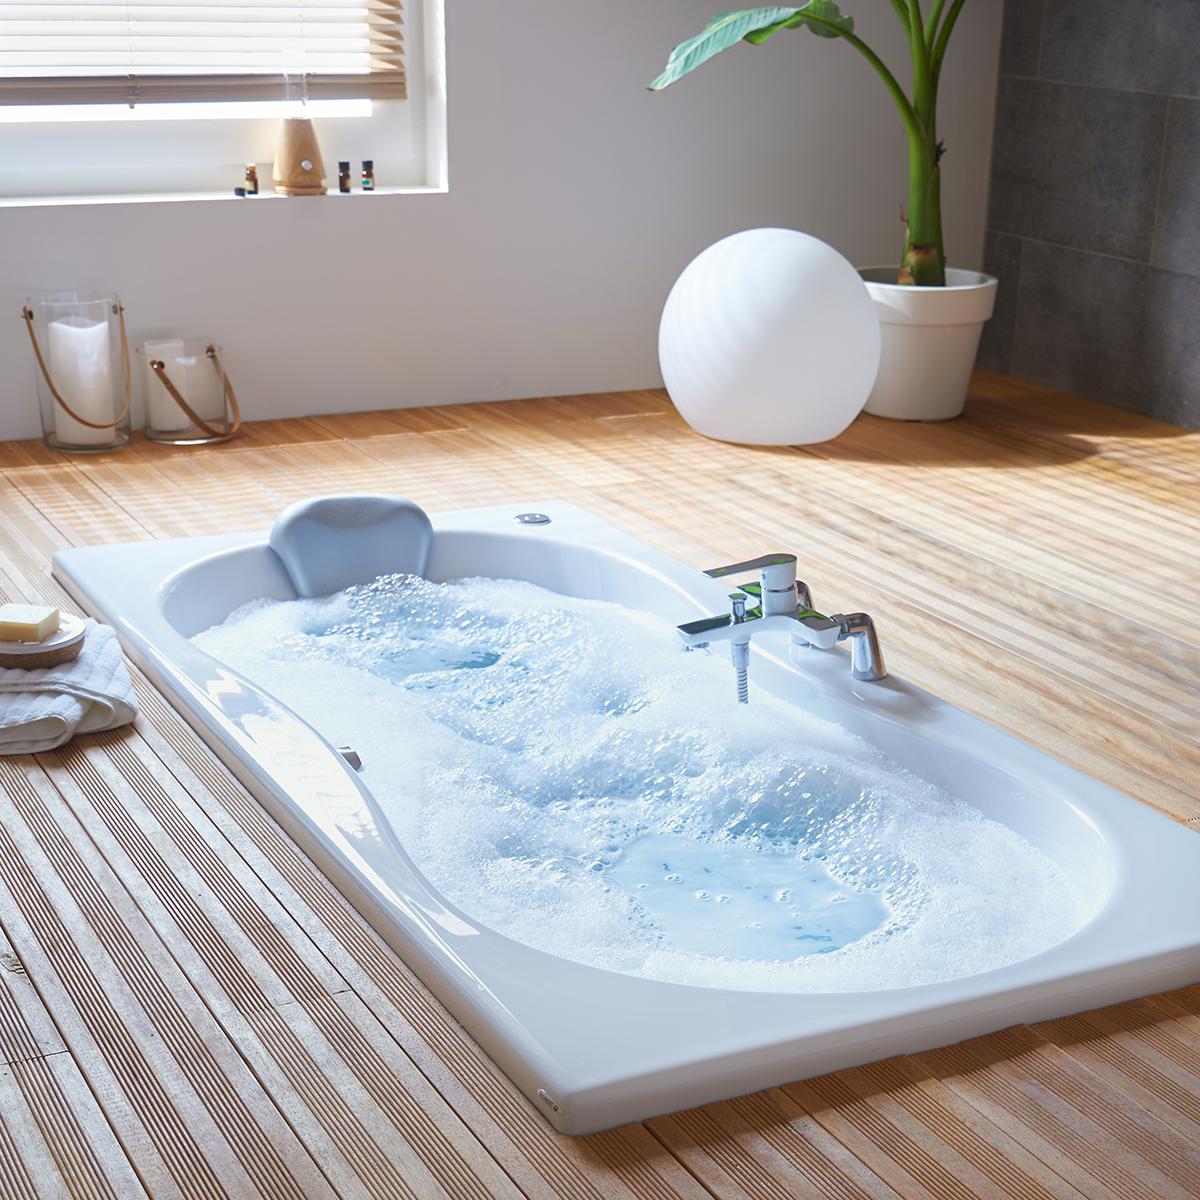 Pin by Leroy Merlin on Salle de bains | Pinterest | Bath shower ...